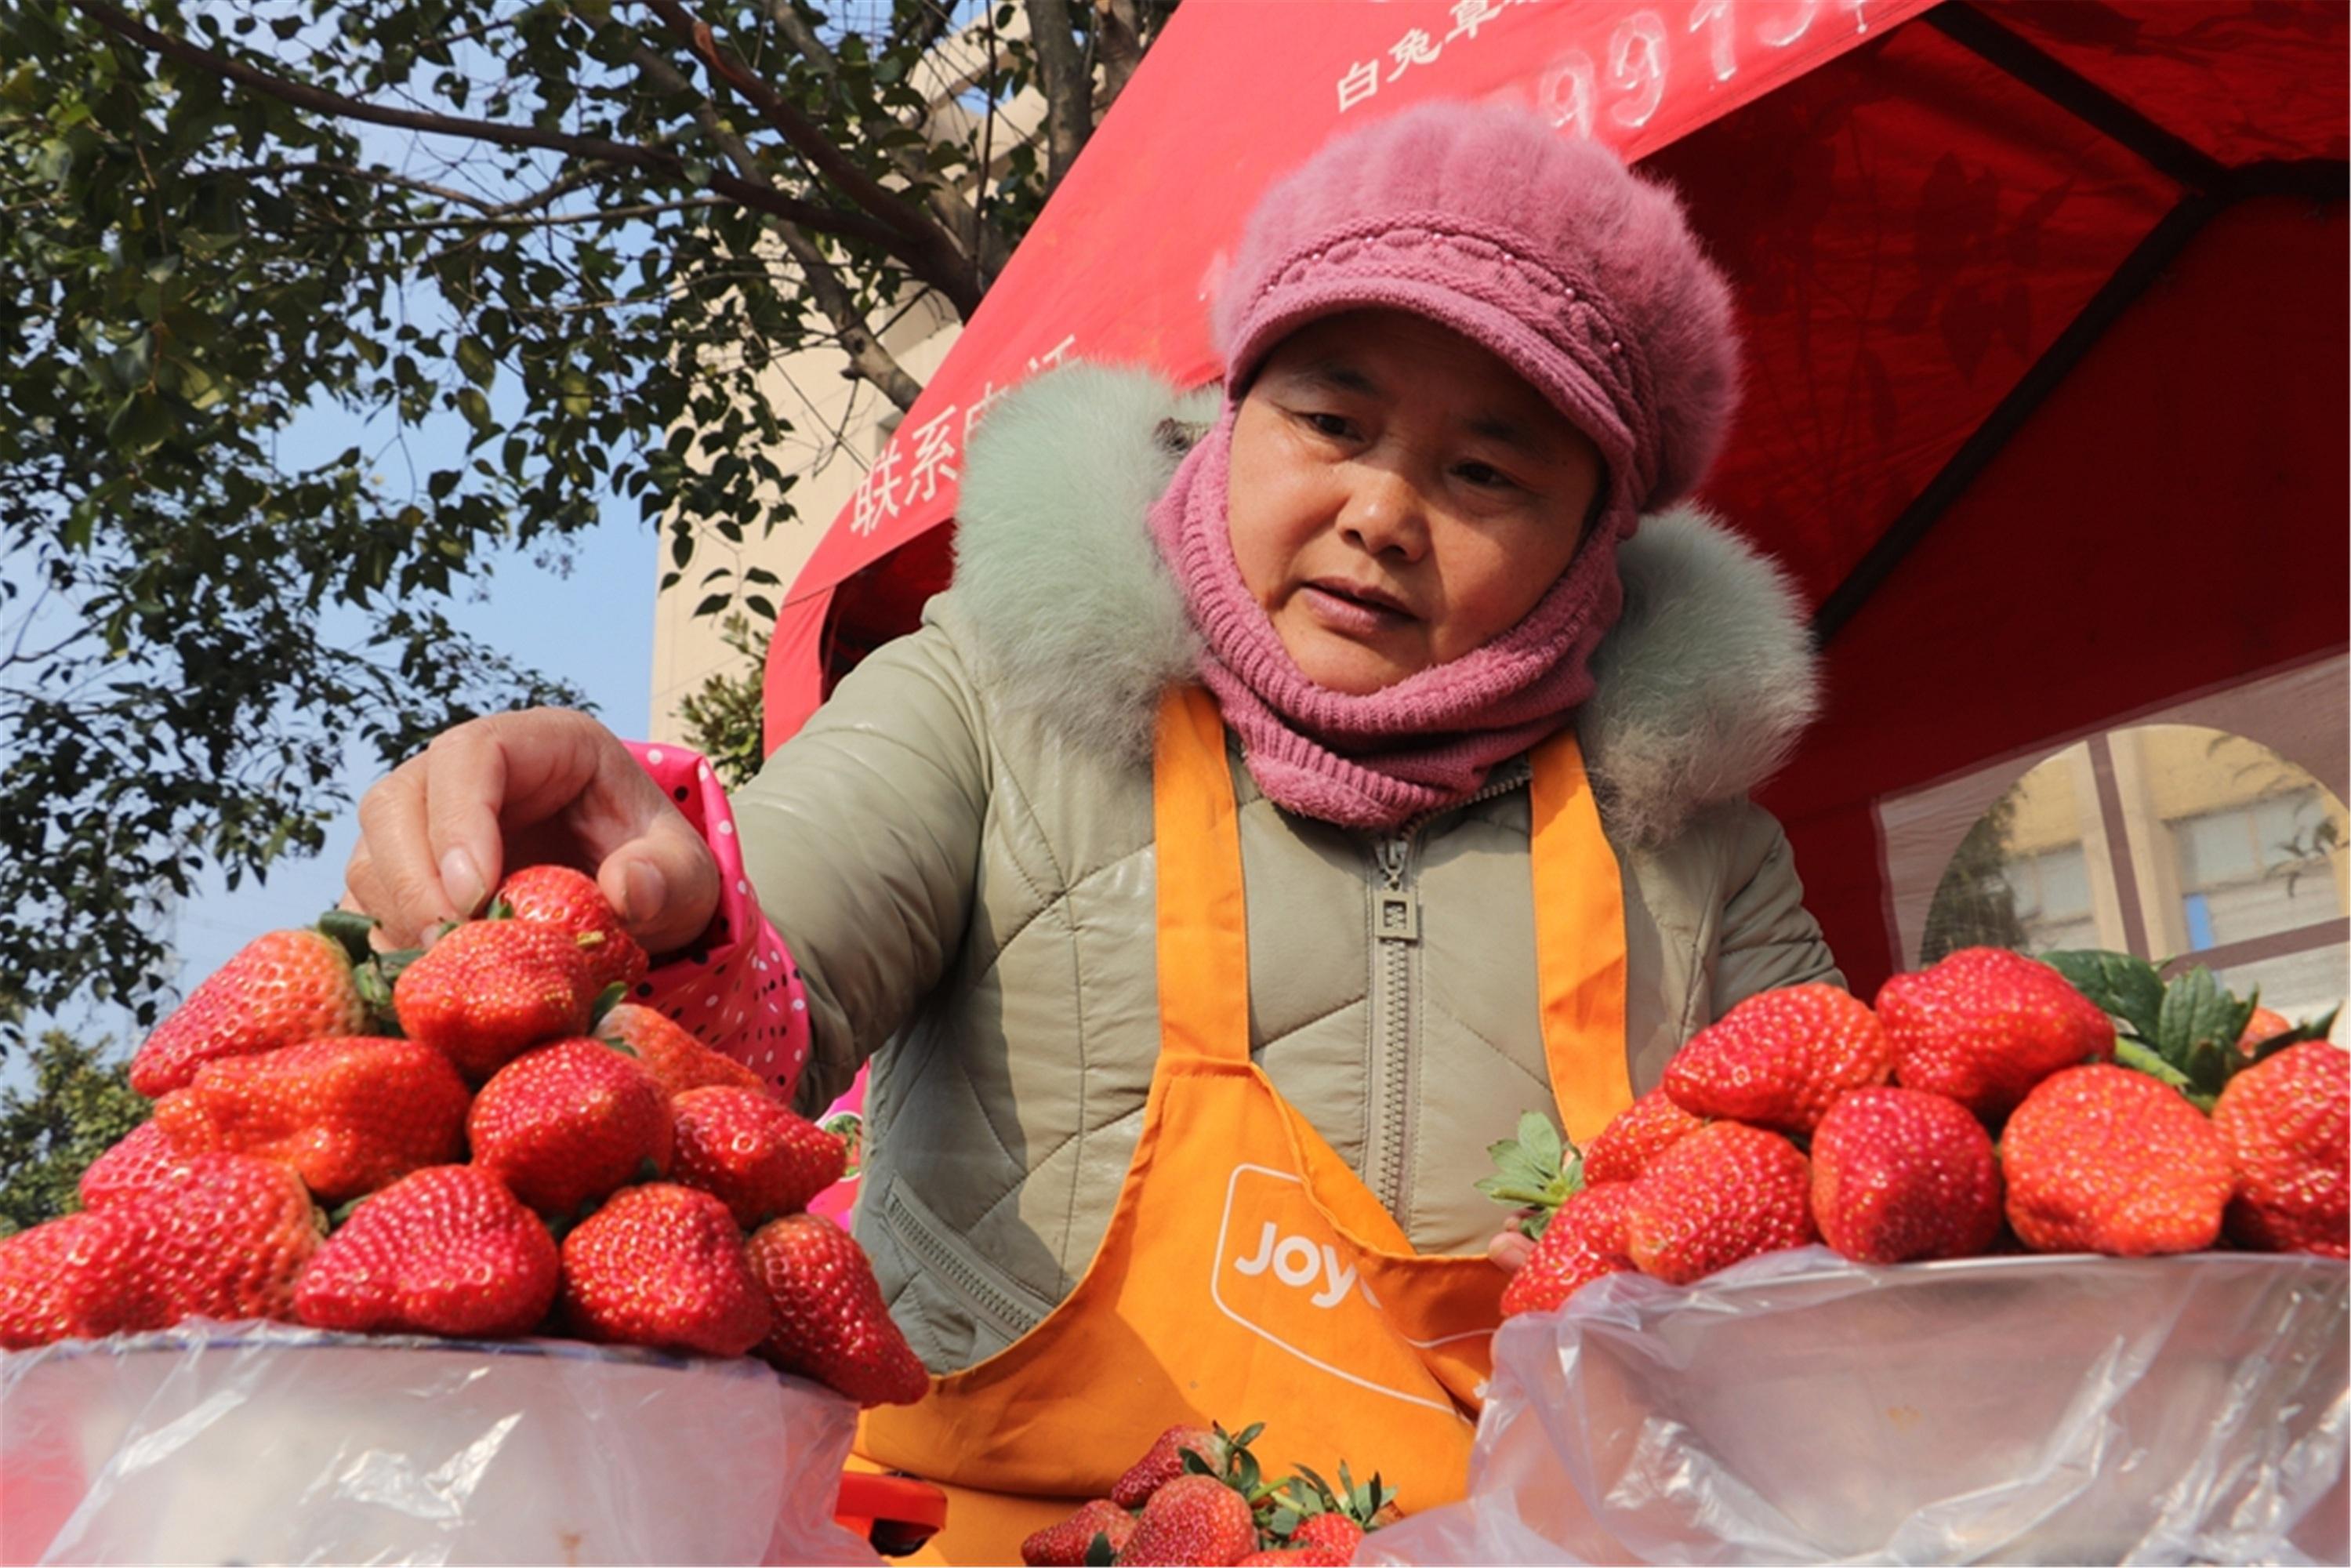 Strawberry brings high profits to Jiangsu farmers